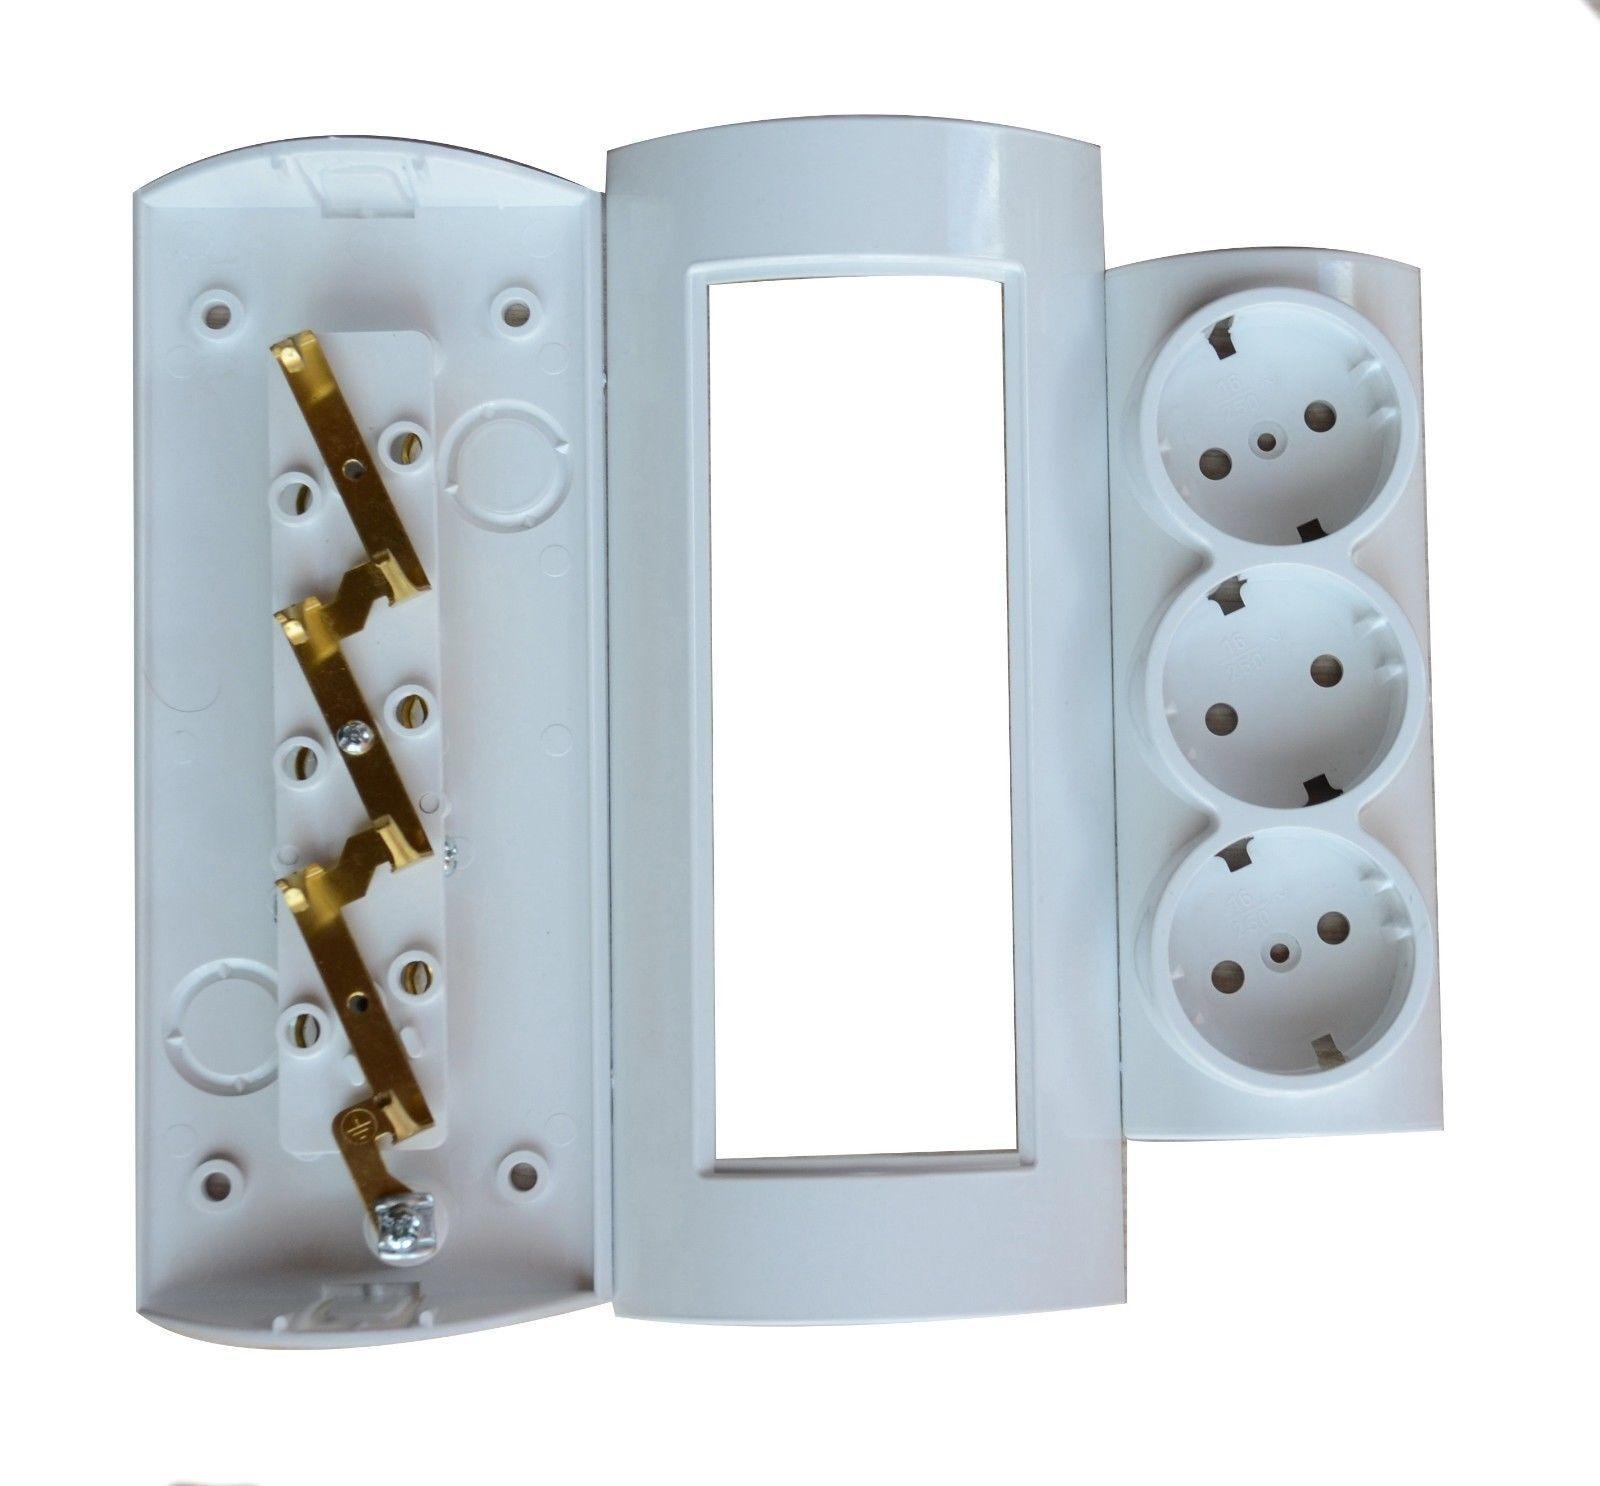 Enchufe combinado Atra 3 enchufes en un solo dispositivo